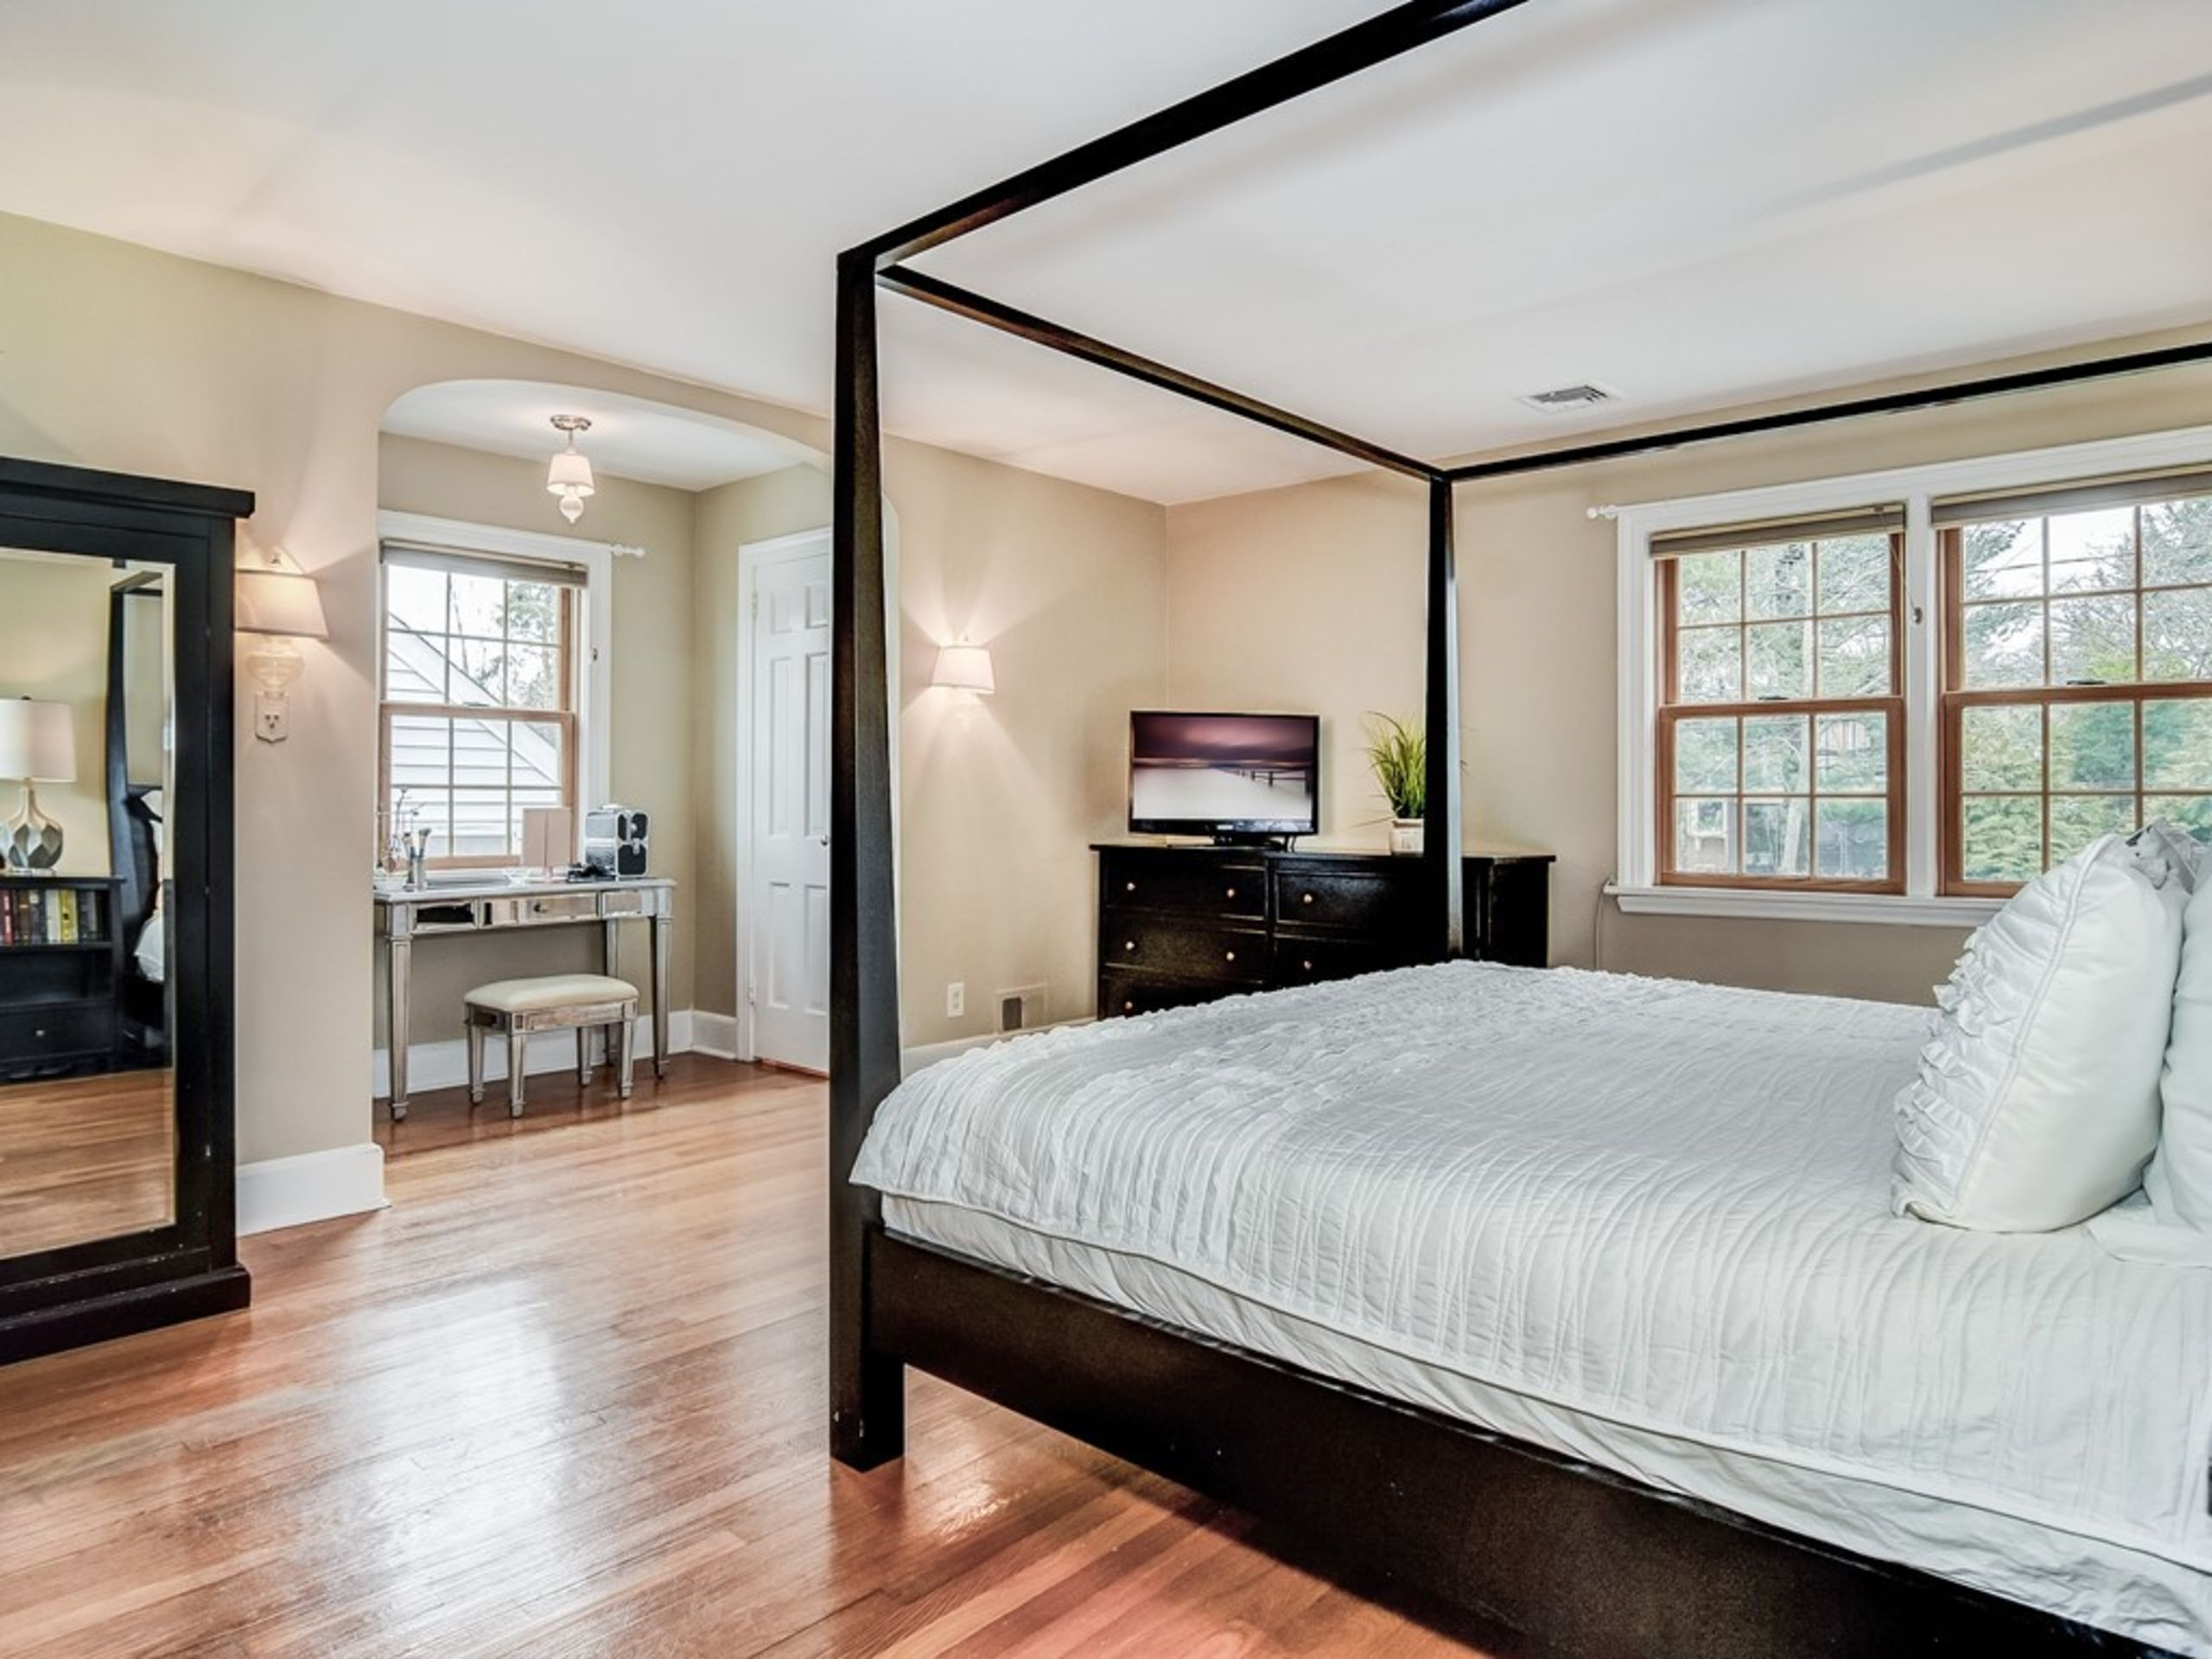 Master Bedroom and EnSuite Bath